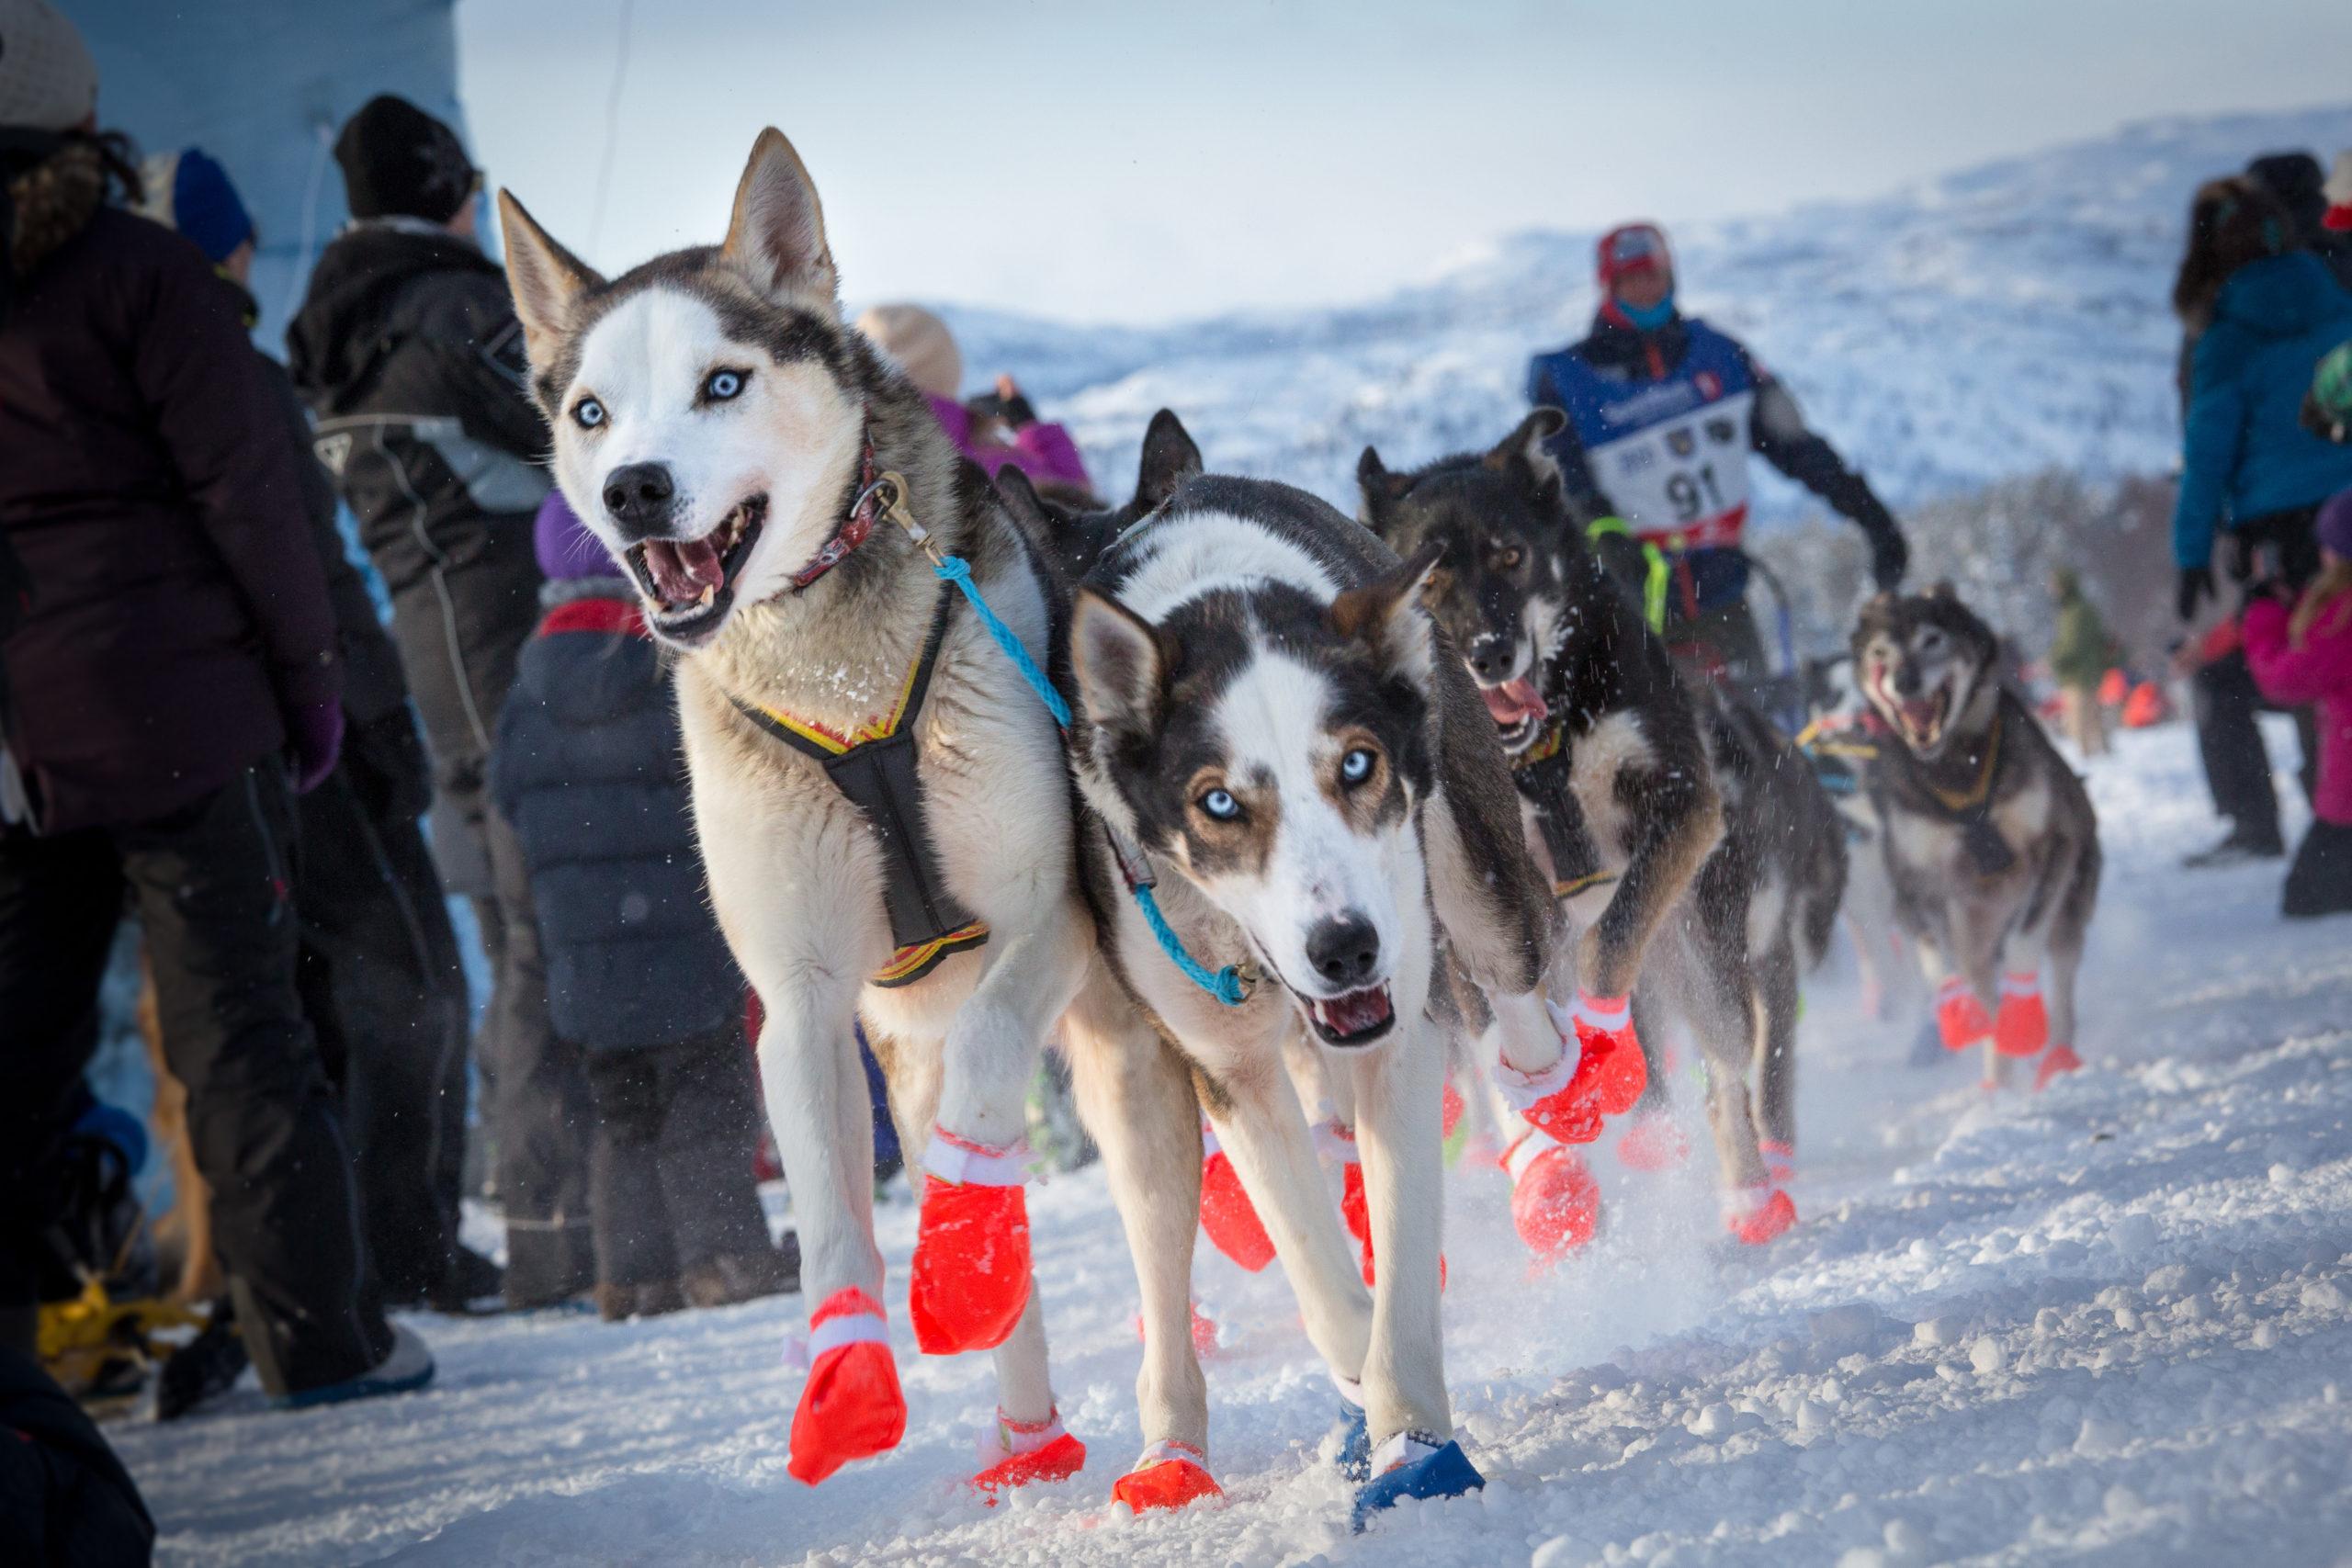 Dog sledding on the Alta river. Alta also hosts the finnmarkslopet where teams dog race across Finnmark © Konrad Konieczny